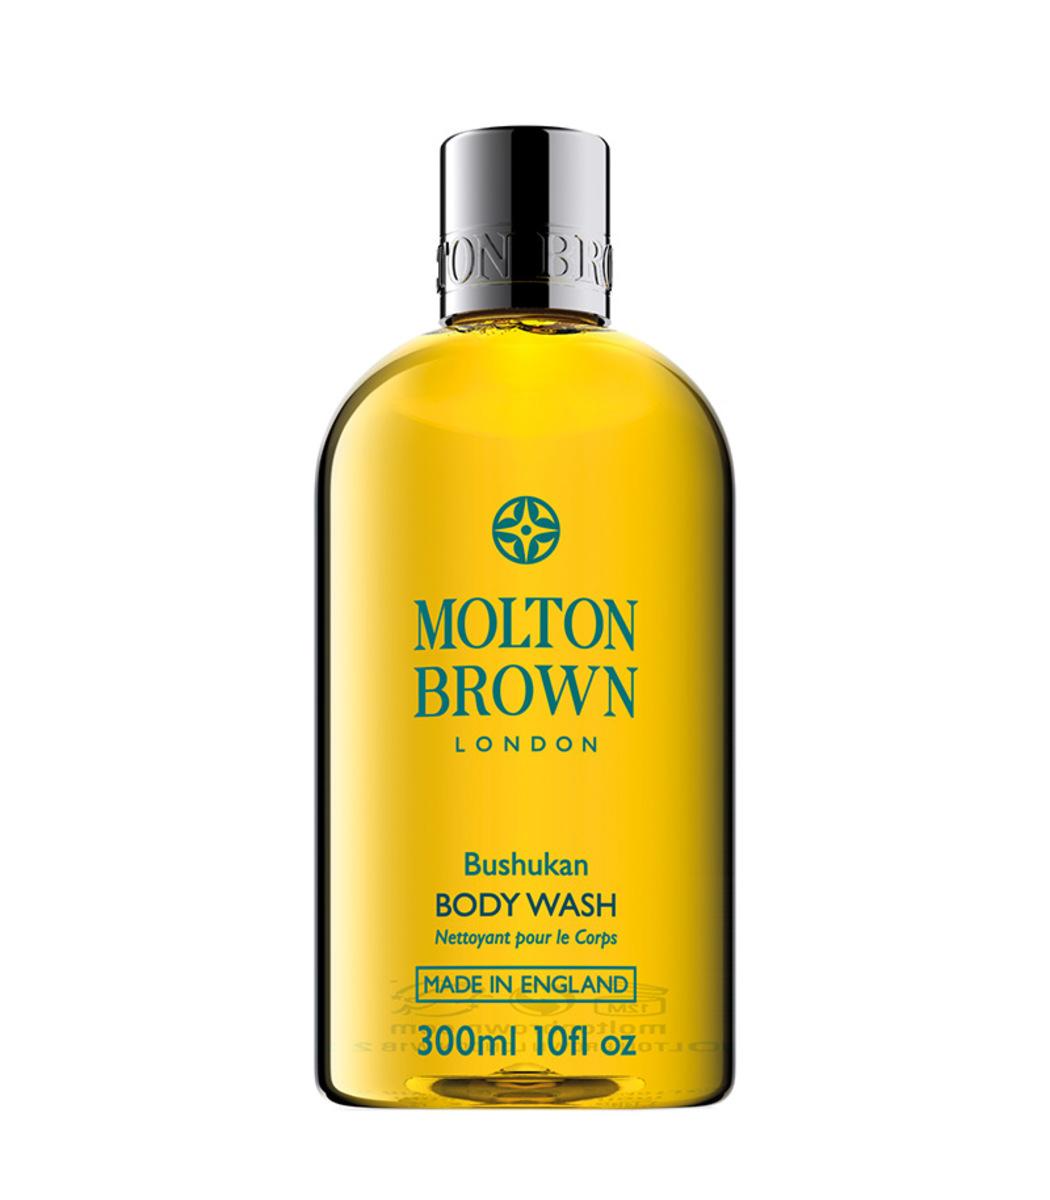 MOLTON BROWN Bushukan Body Wash